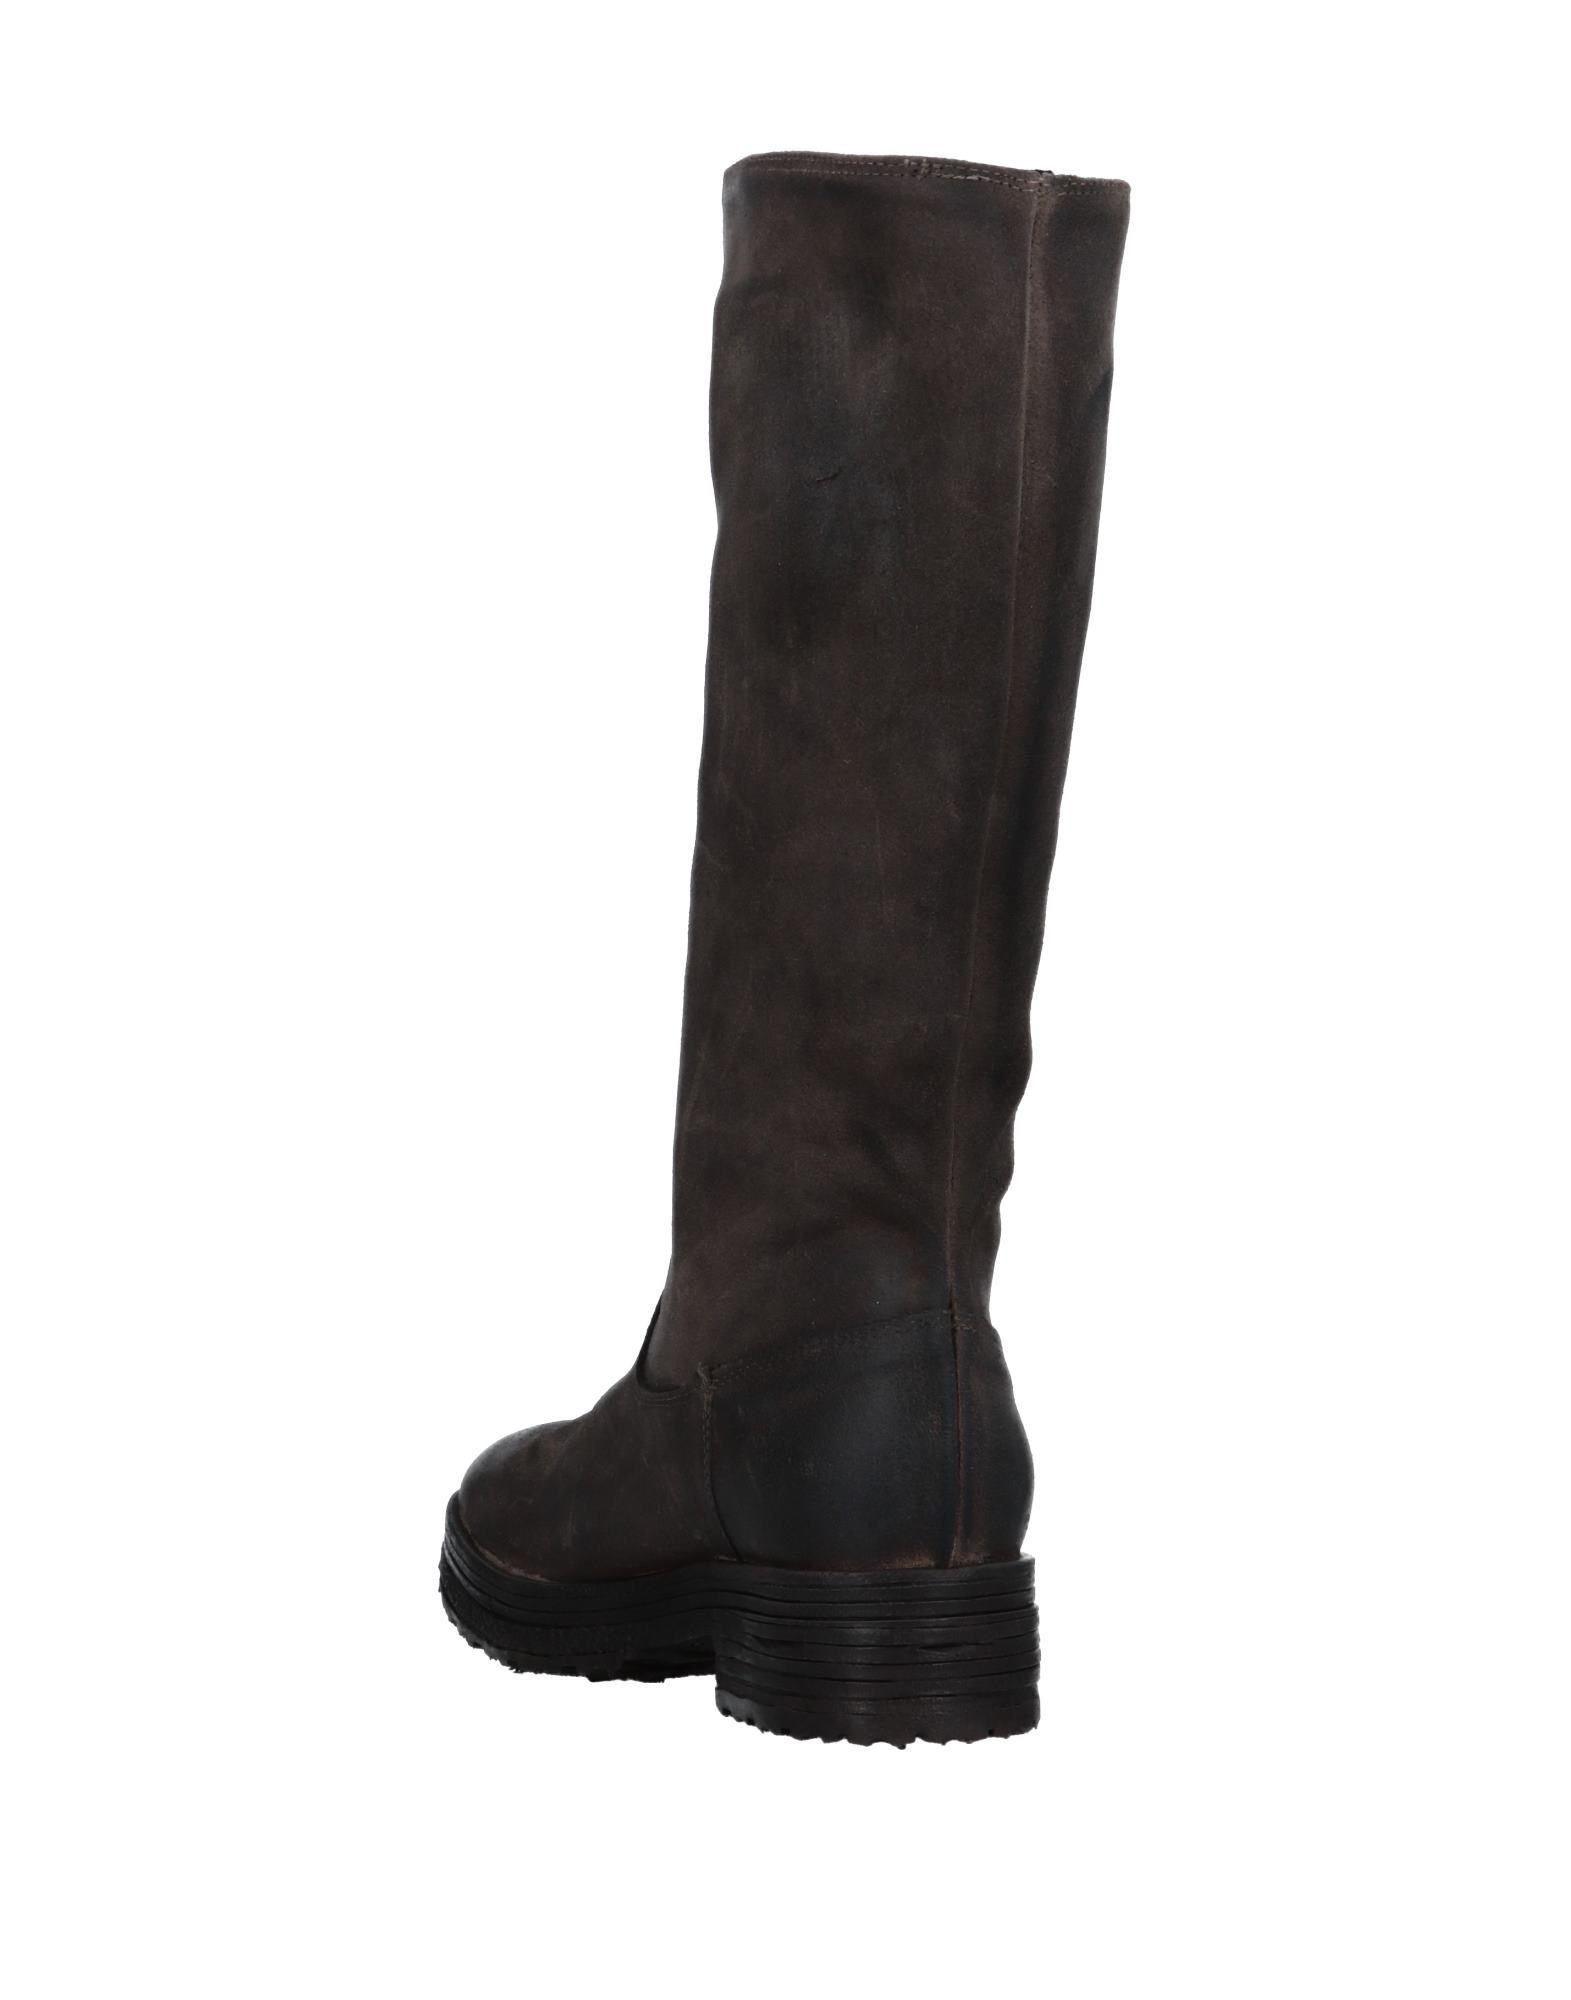 Zoe Stiefel Damen  Schuhe 11534093HF Gute Qualität beliebte Schuhe  001992